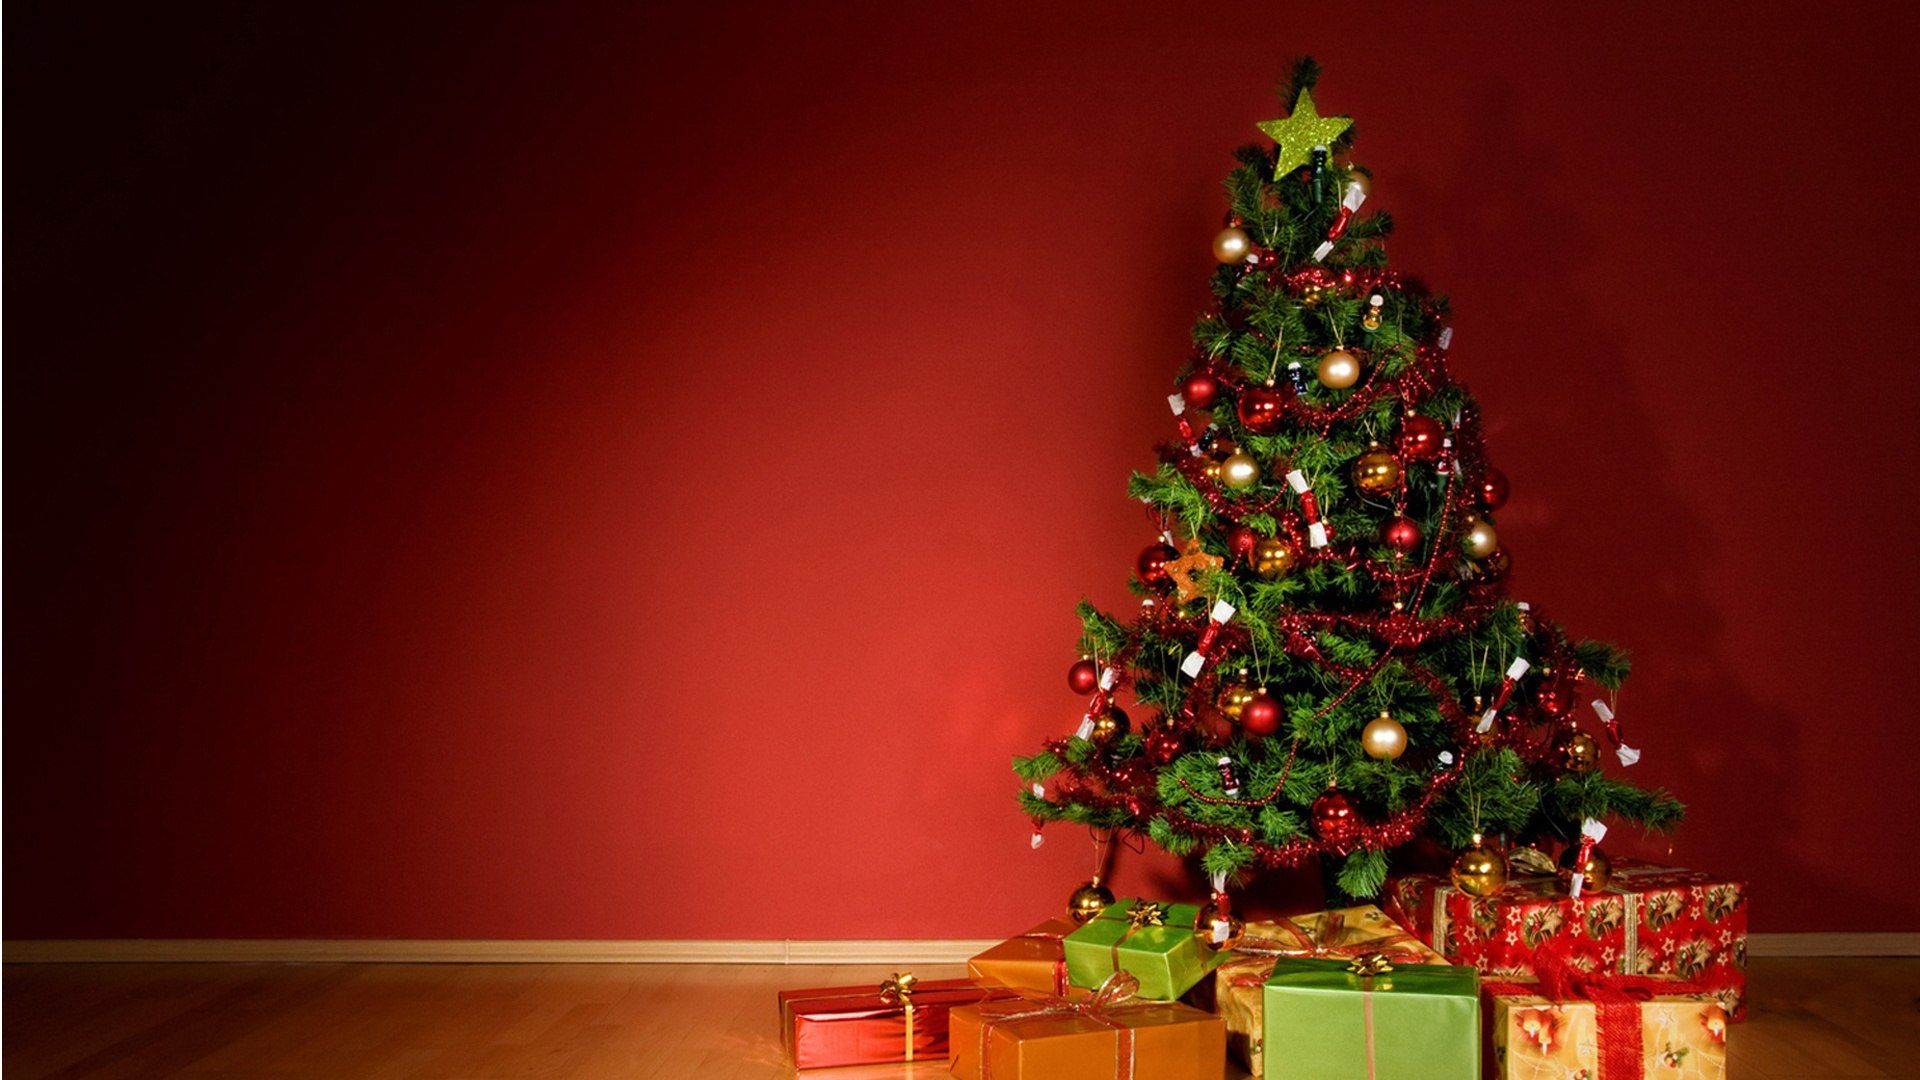 Christmas Tree download nice wallpaper